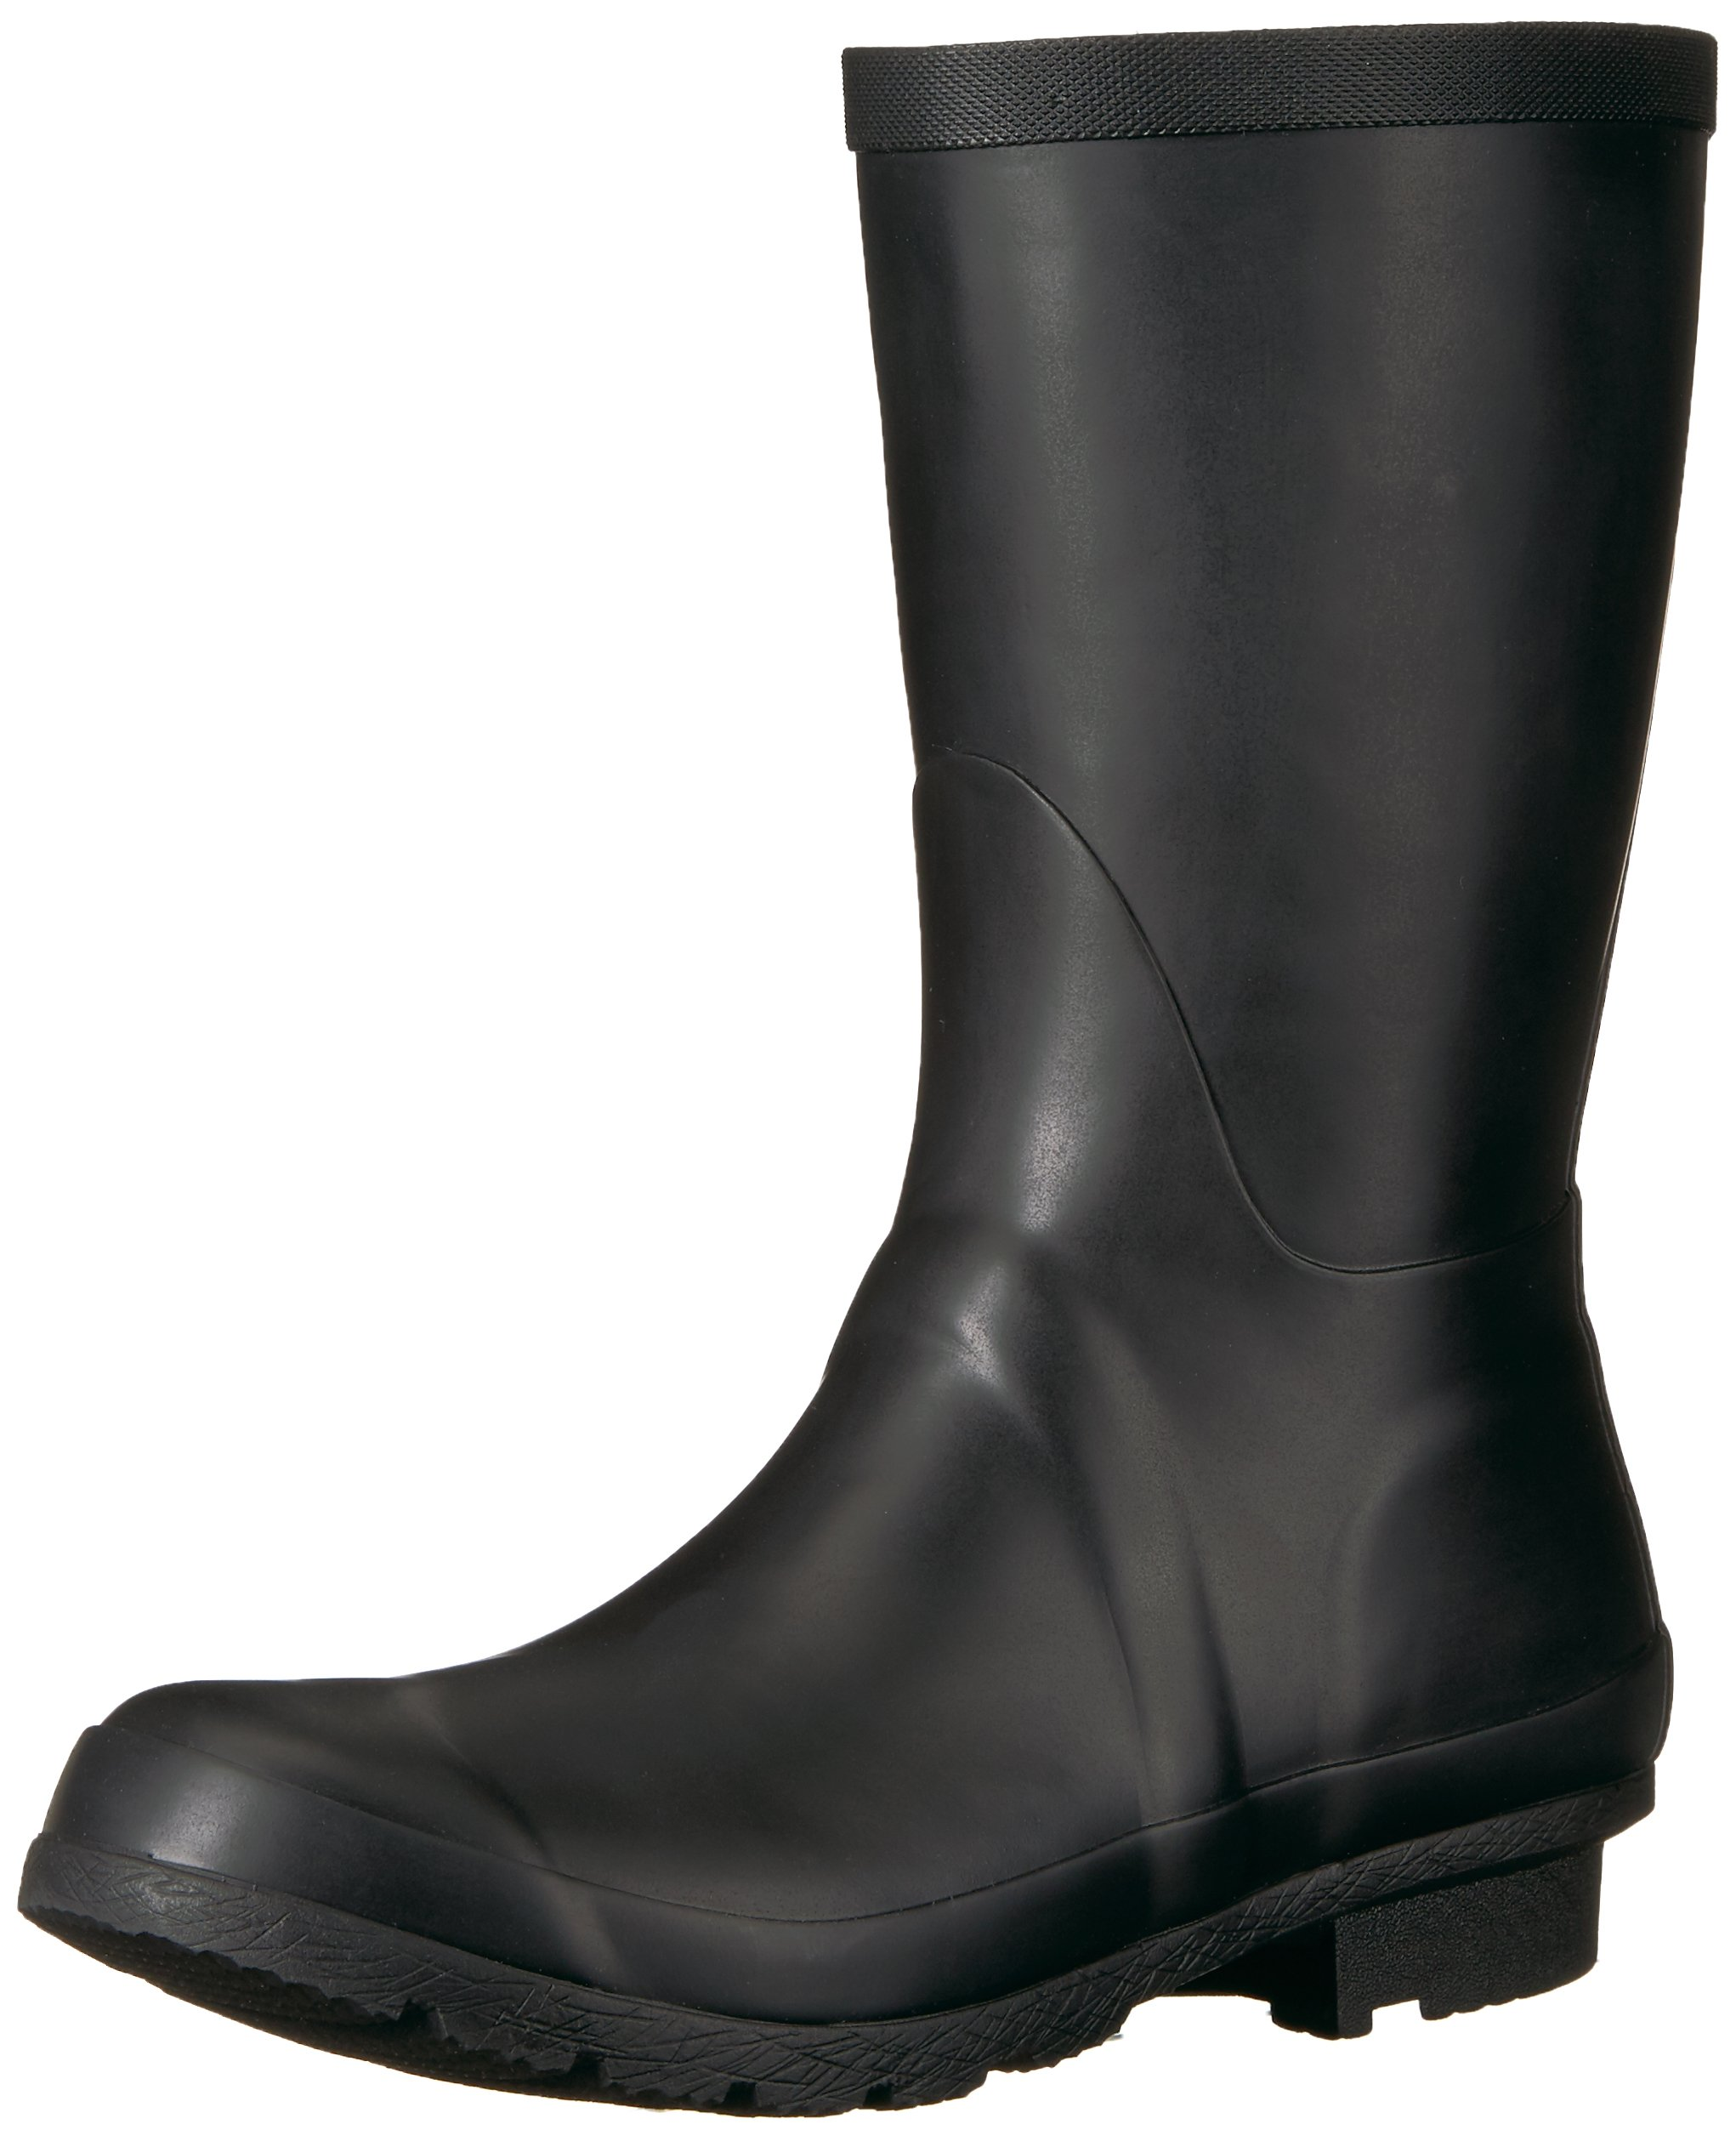 206 Collective Women's Linden Mid Rain Boot, Black, 9 B US